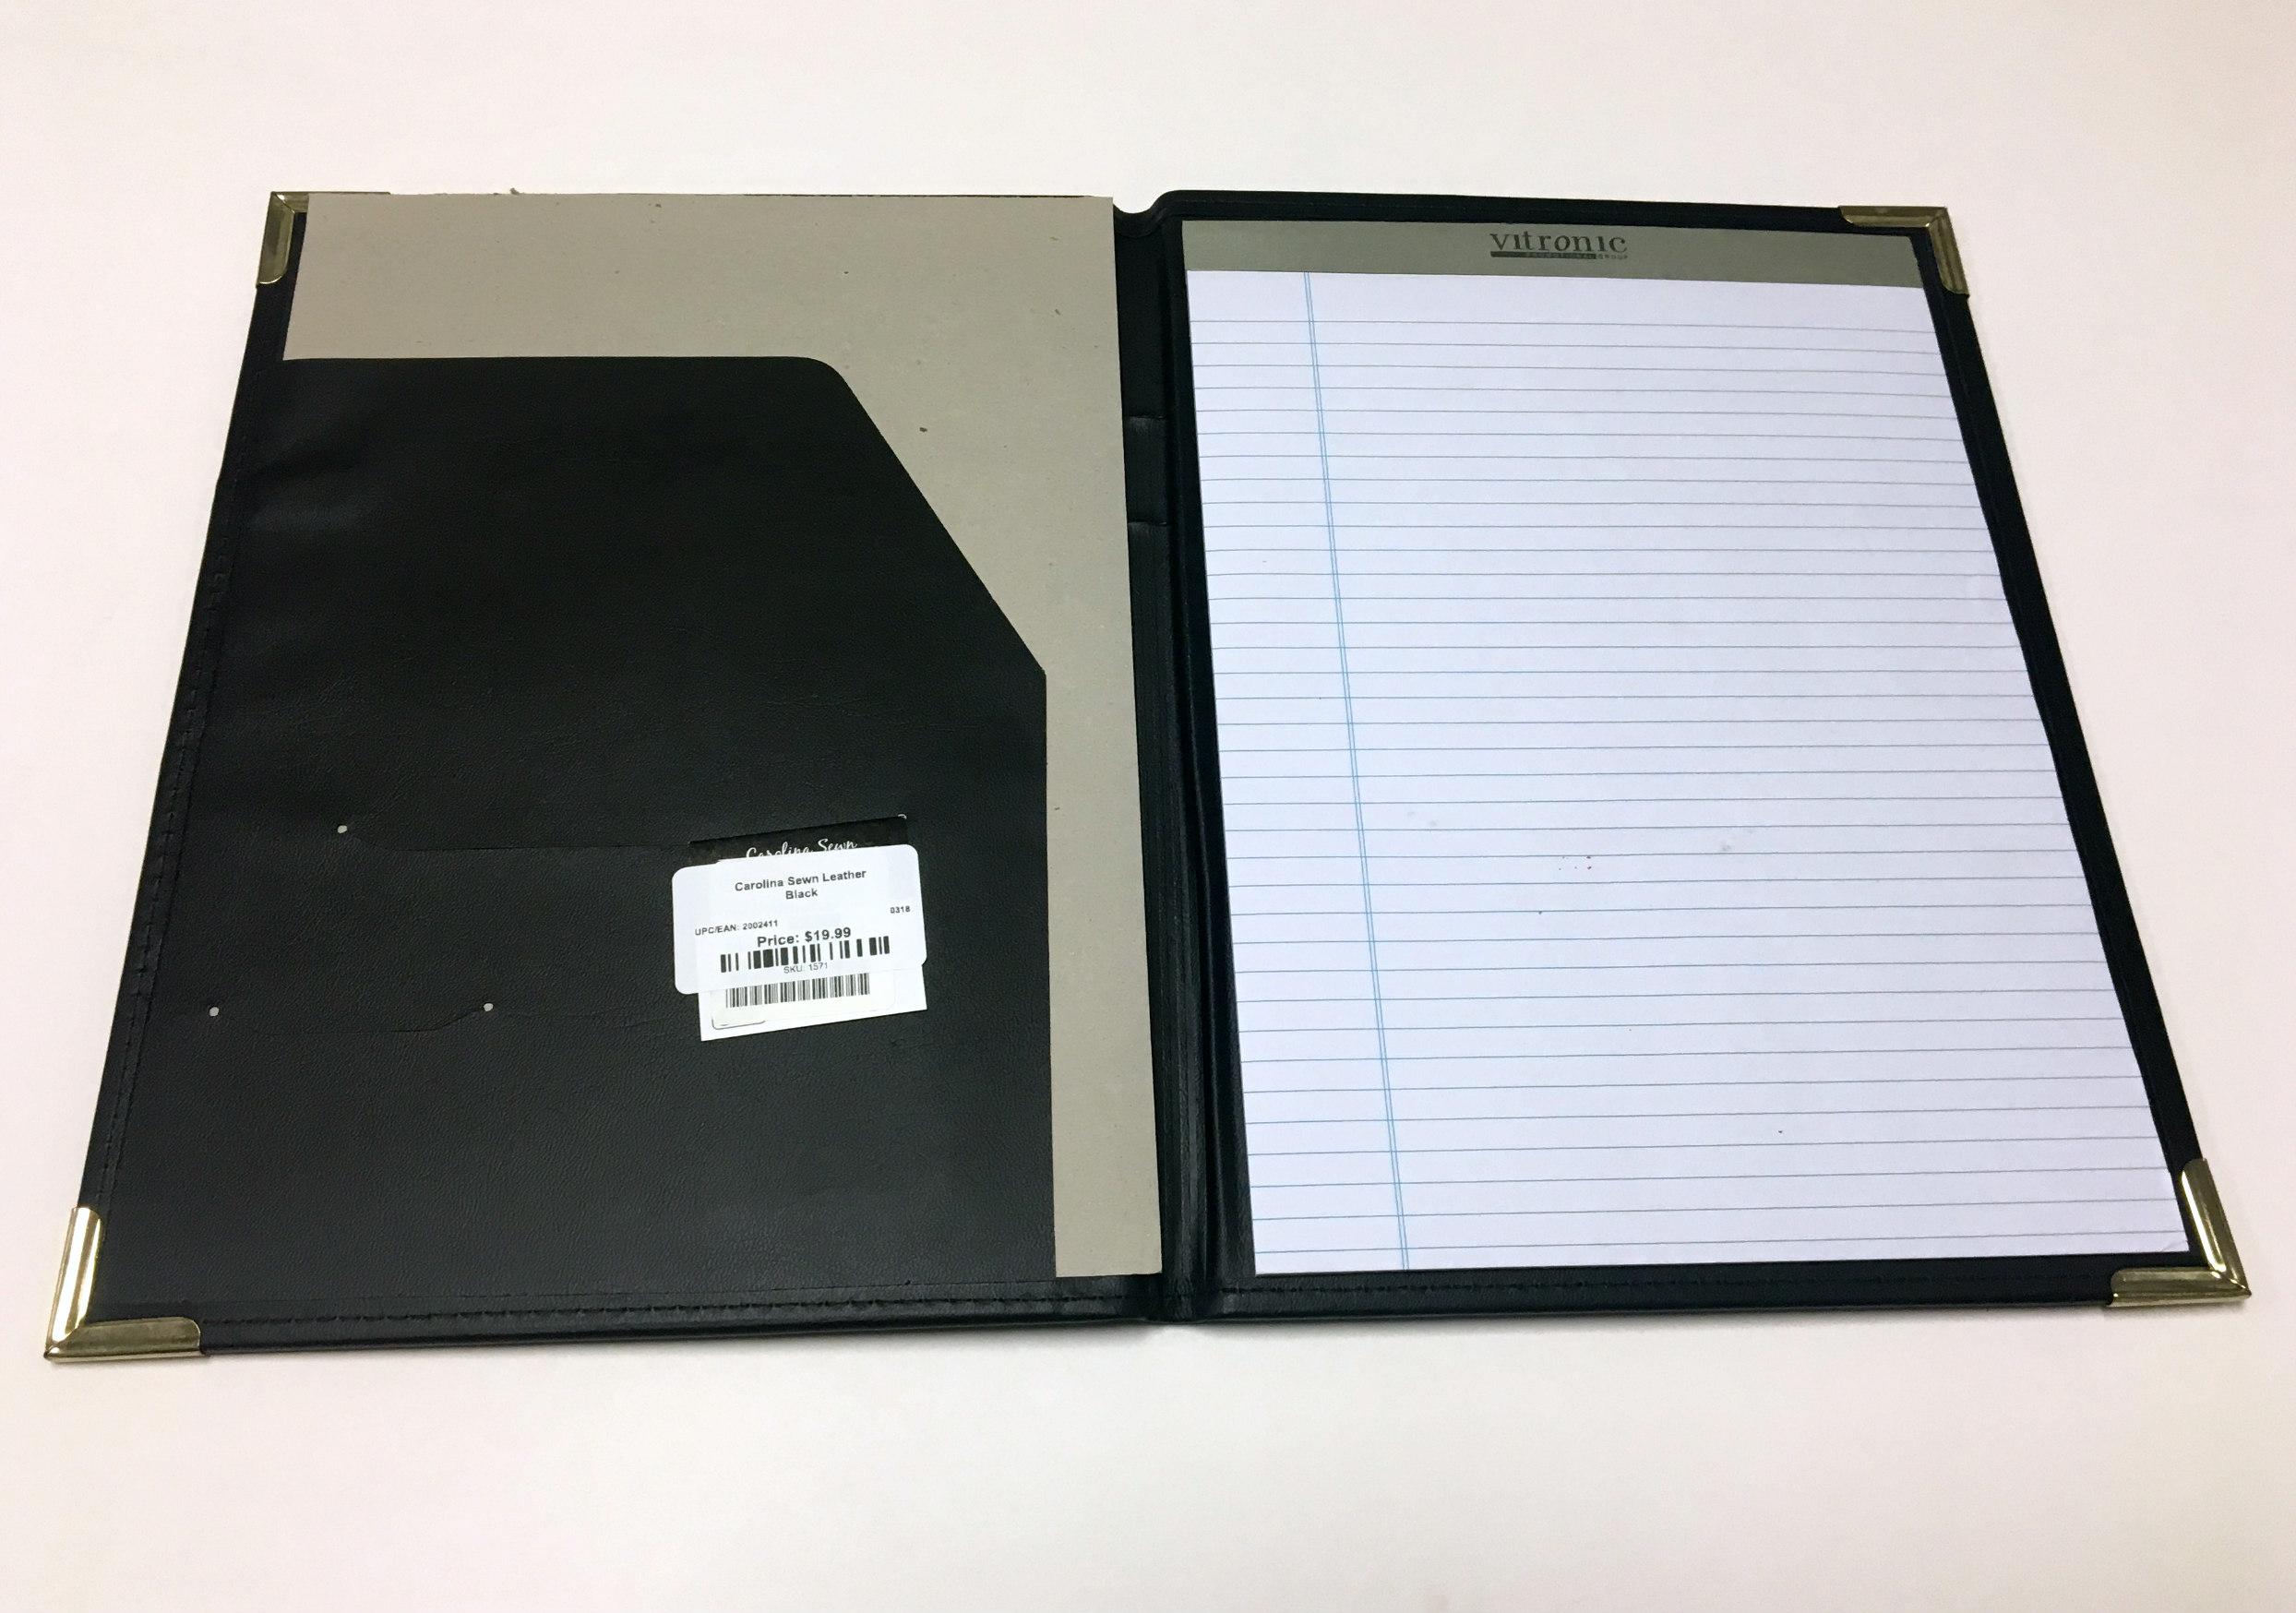 Alternative Image for the Carolina Sewn Leather Padfolio product